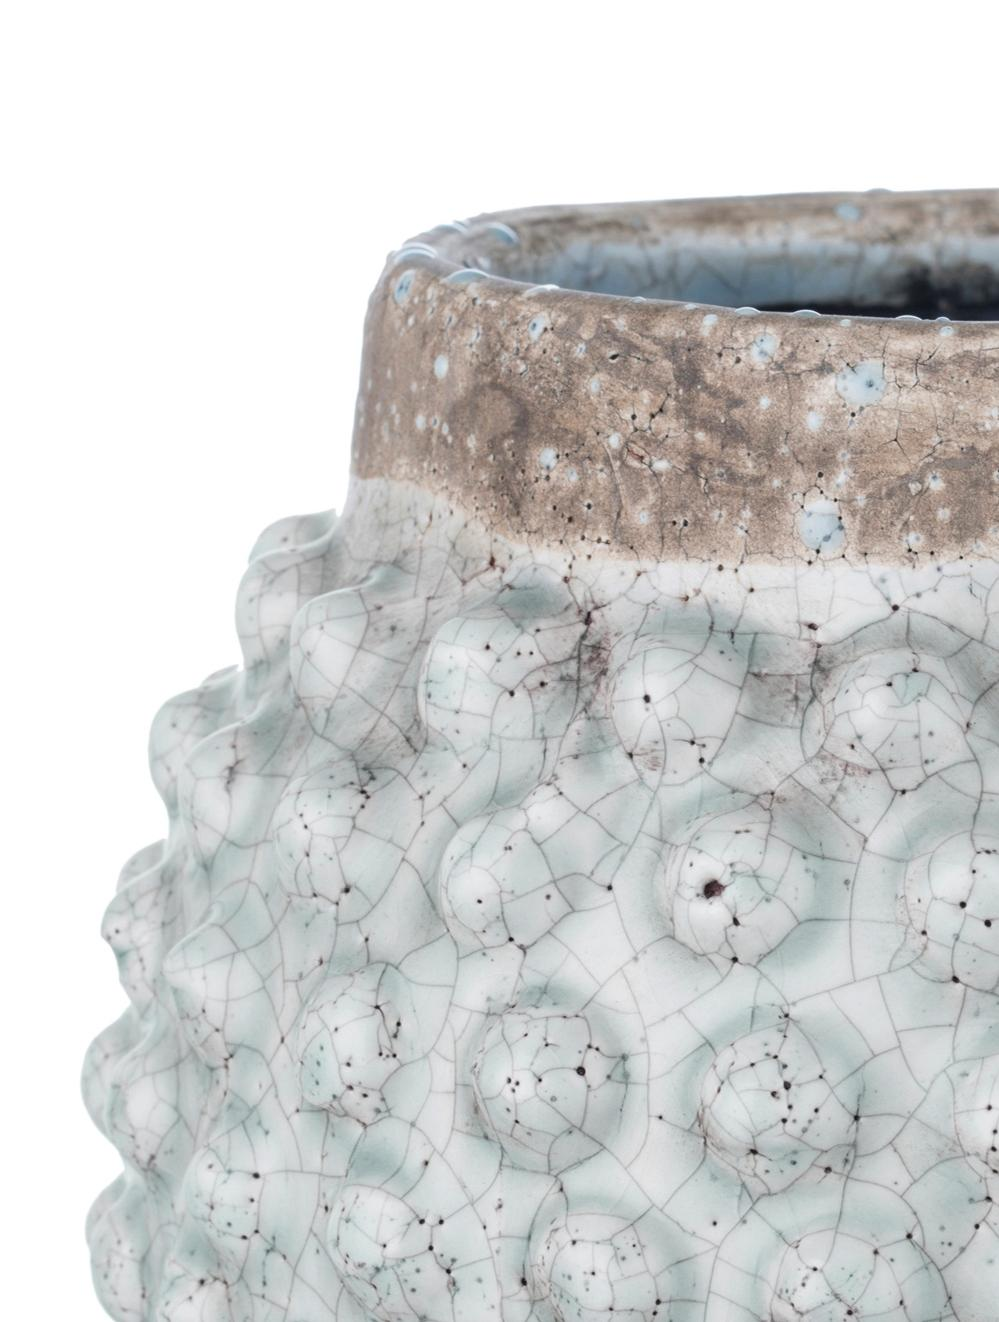 Übertopf Magna aus Keramik, Keramik, glasiert, Braun, Blau, Ø 20 x H 19 cm